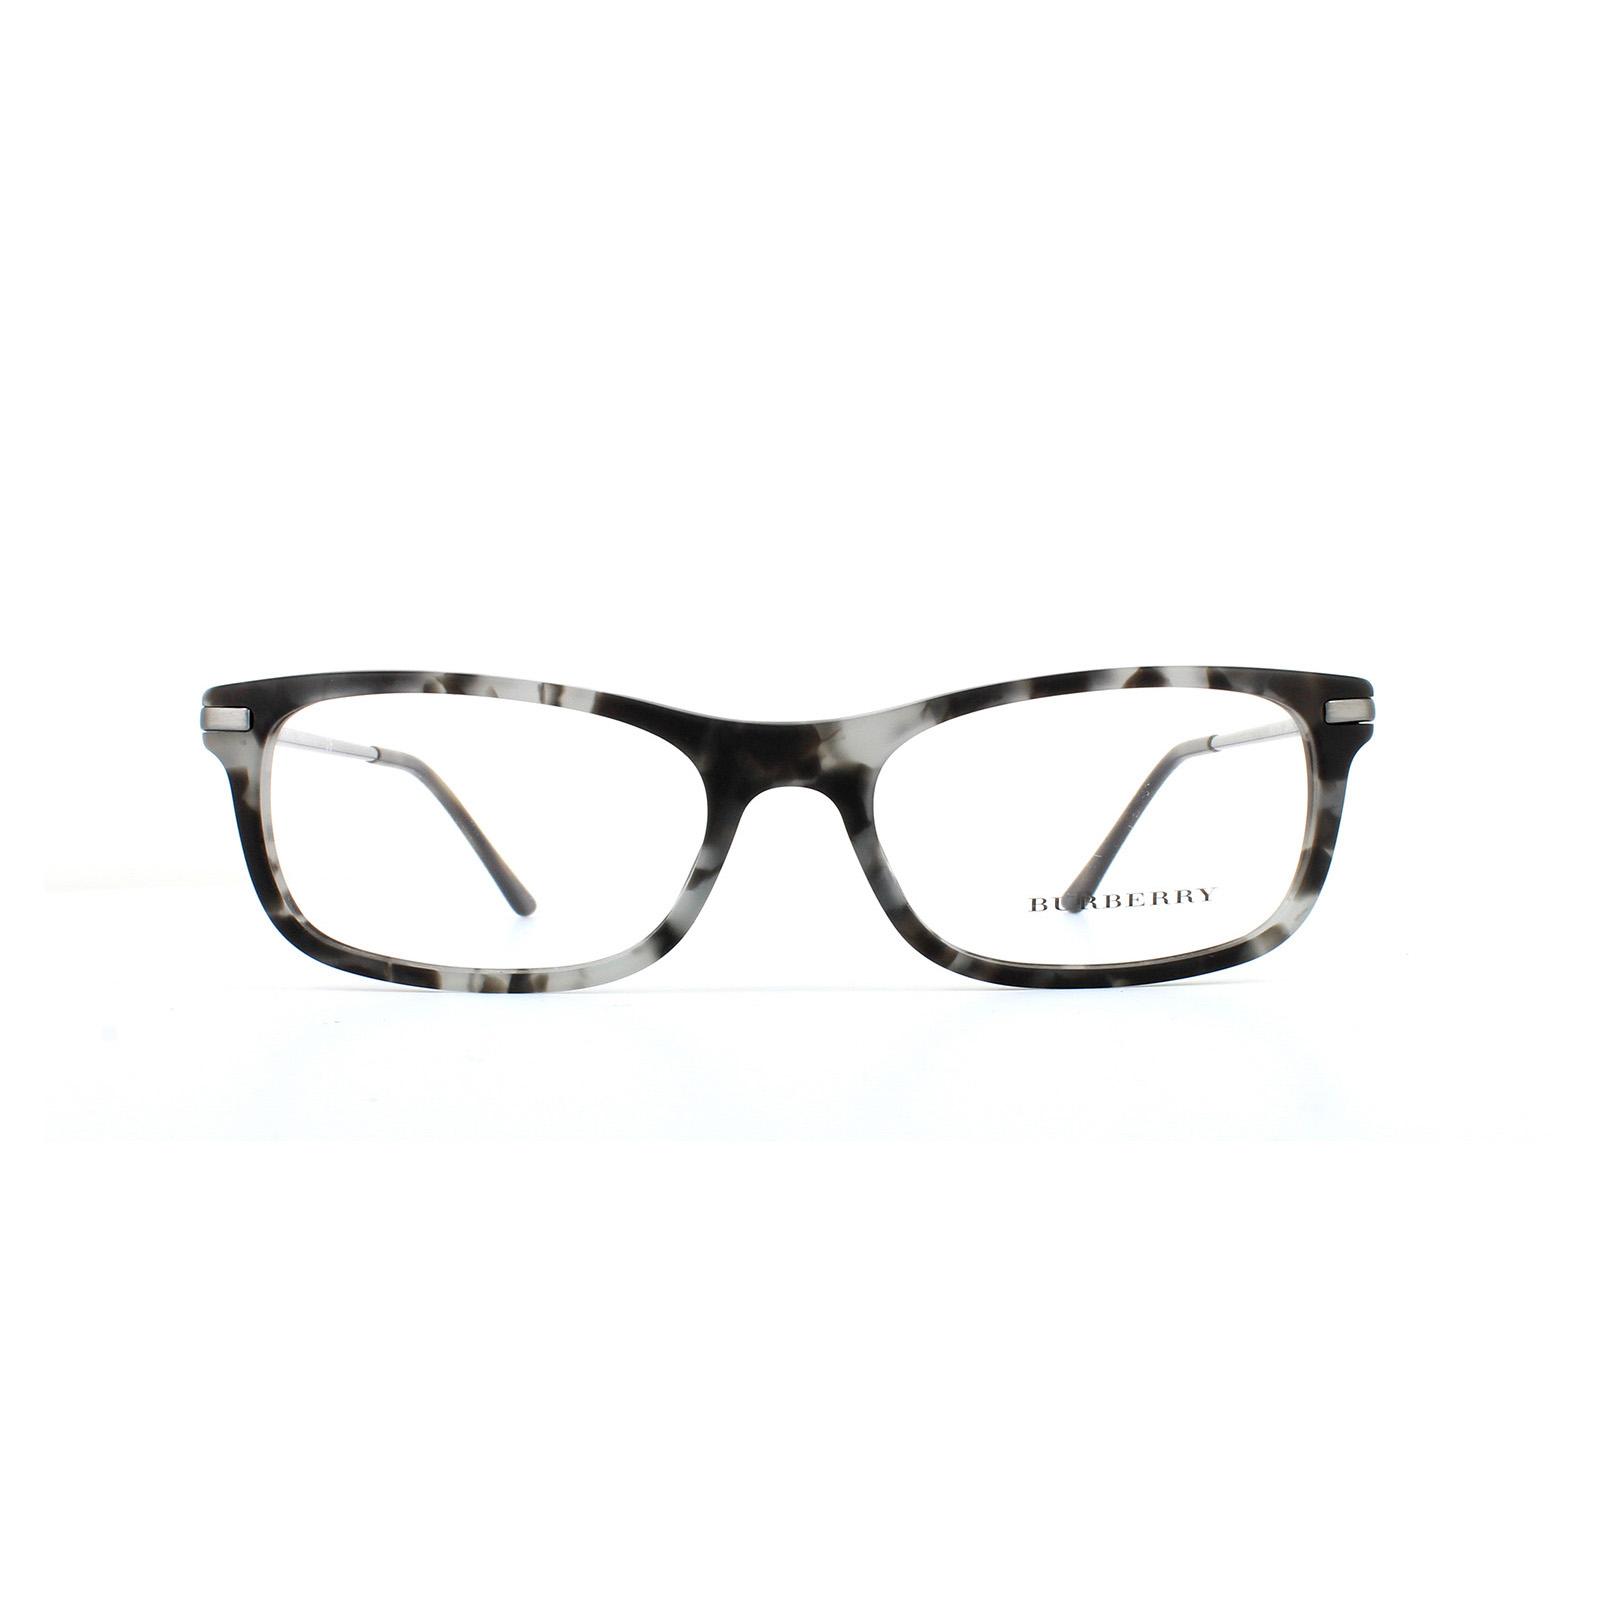 6156213488 Famous Burberry Glasses Frames Composition - Frames Ideas Handmade ...